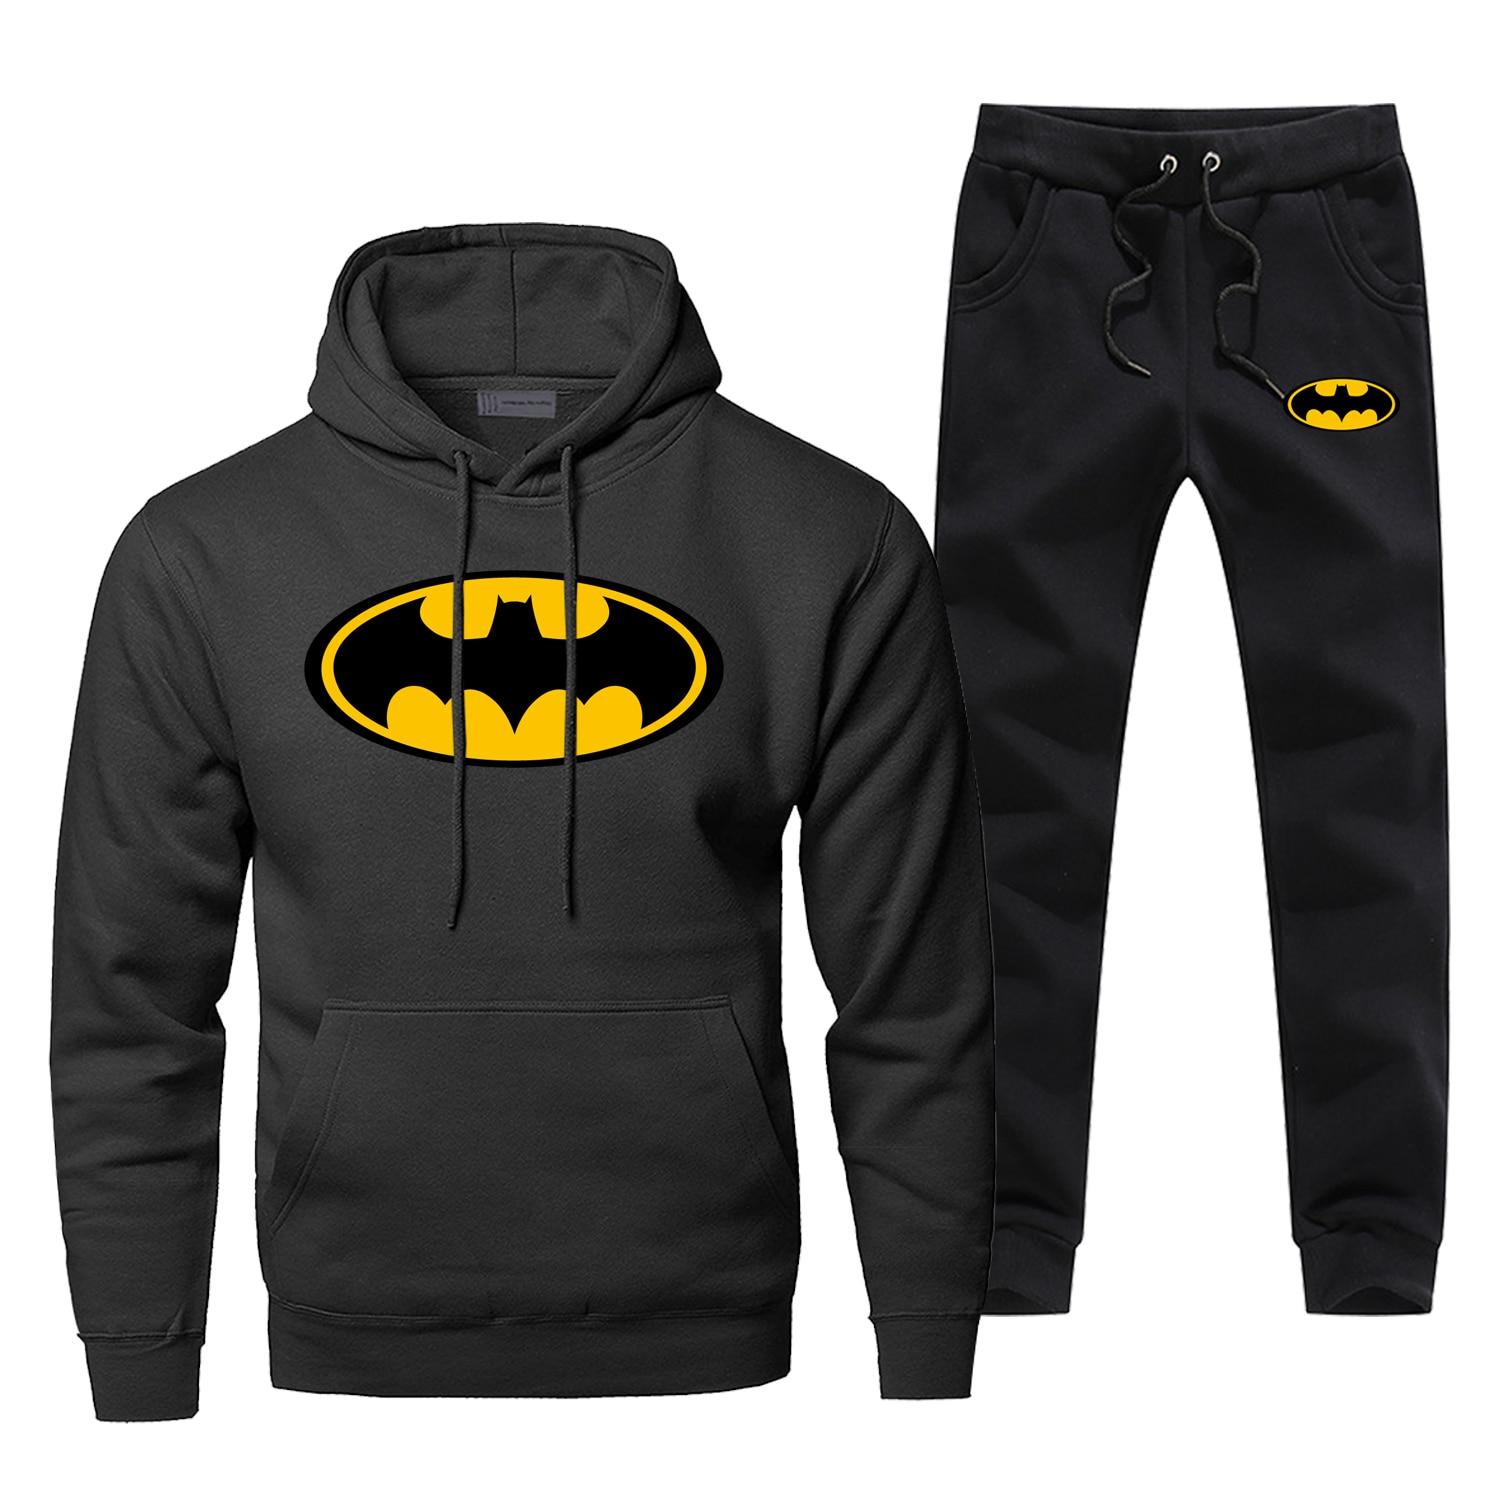 2019 Winter Warm Superhero Batman Men Print Hoodies+pants Sets Fashion Super Hero Sweatshirt Autumn Fleece Mens Sportswear